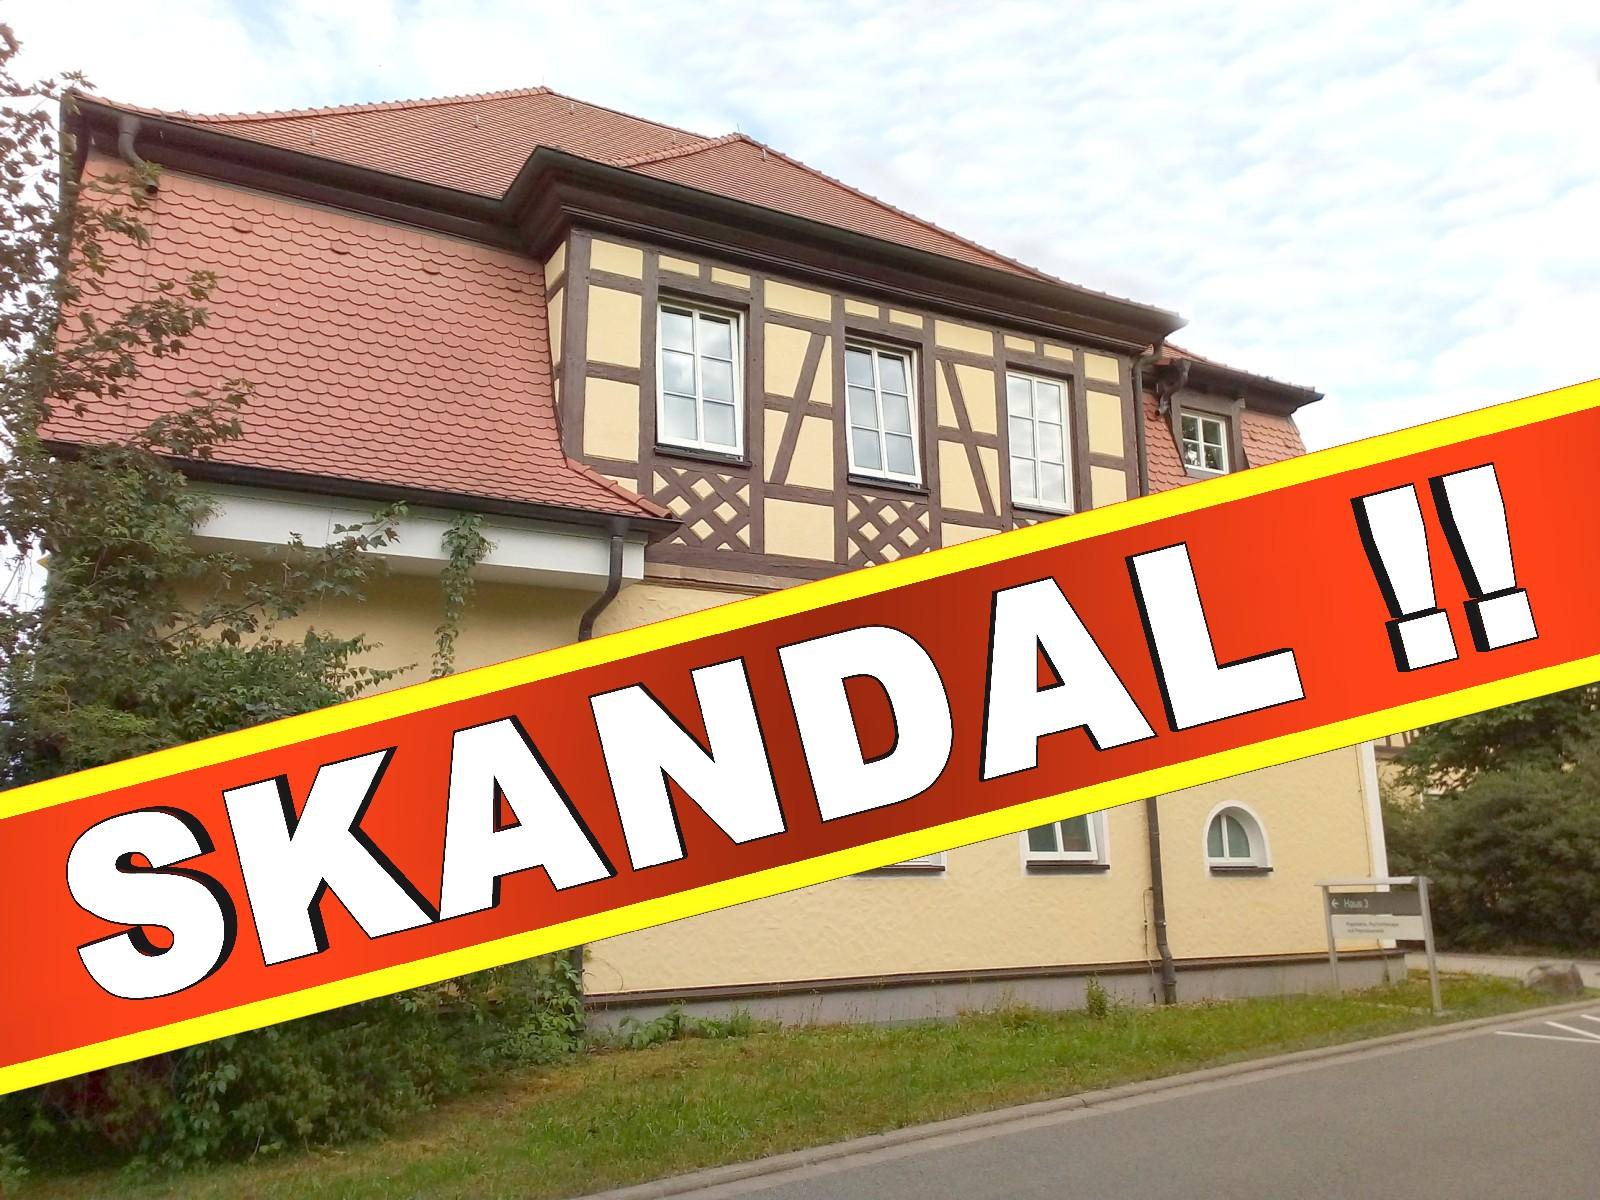 Bezirksklinikum Obermain Kutzenberg, 96250 Ebensfeld Psychiatrie Polizei Krankenhaus (23)